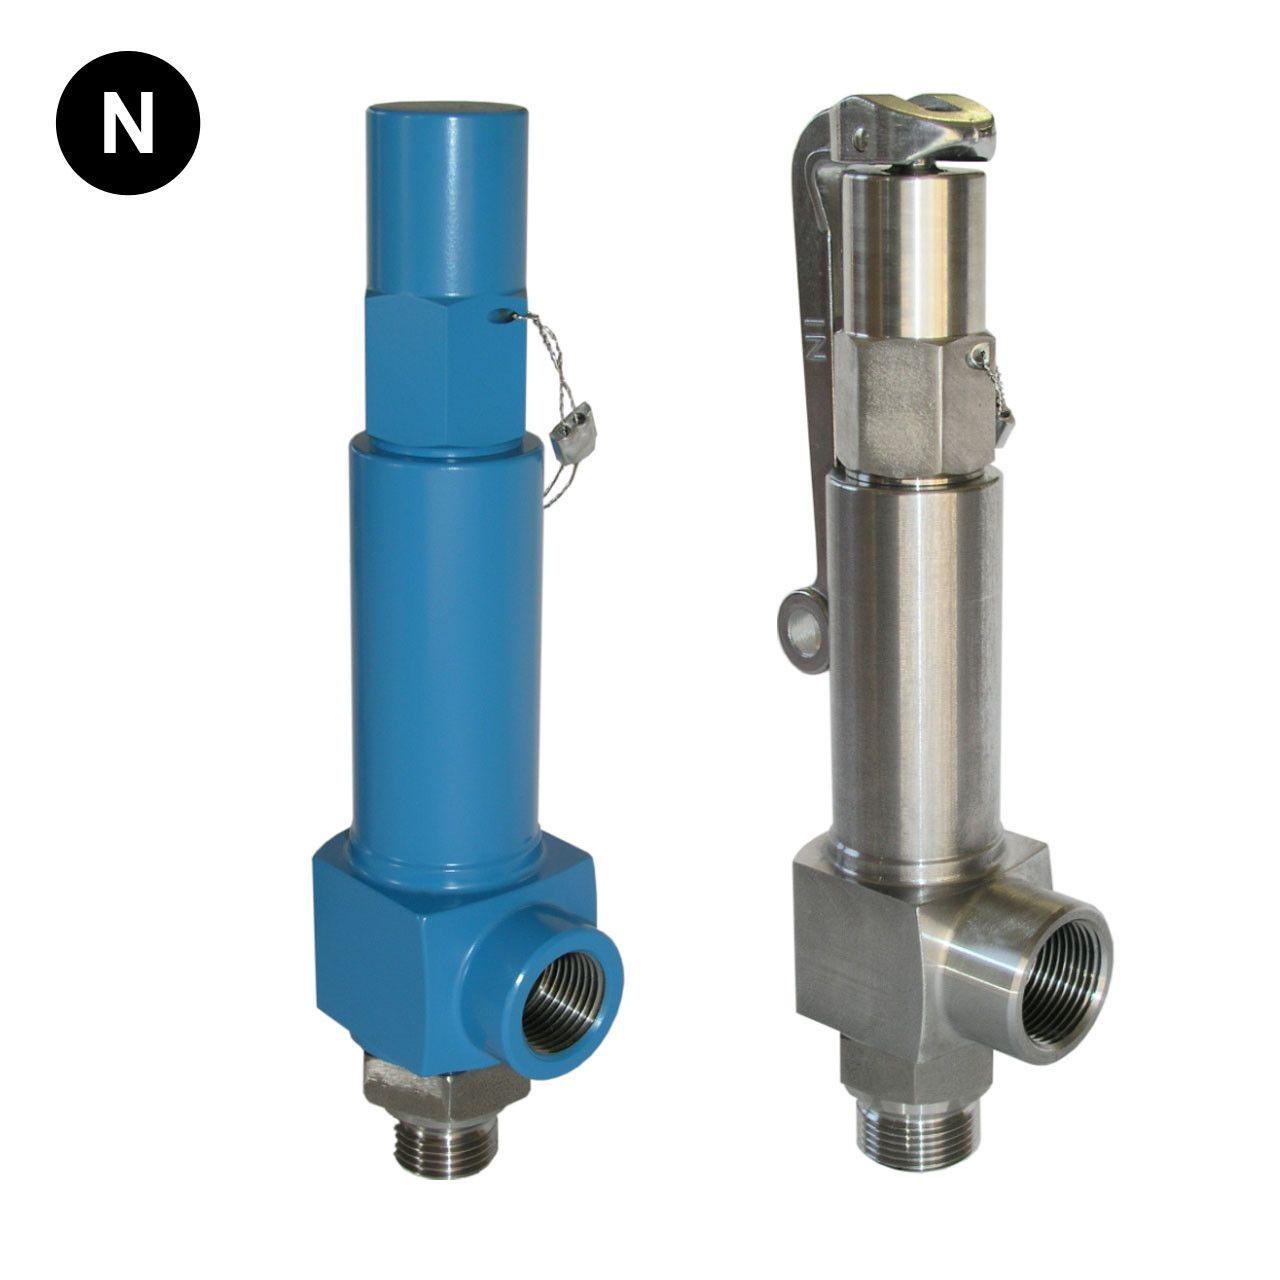 Niezgodka type 140 safety valve stainless steel